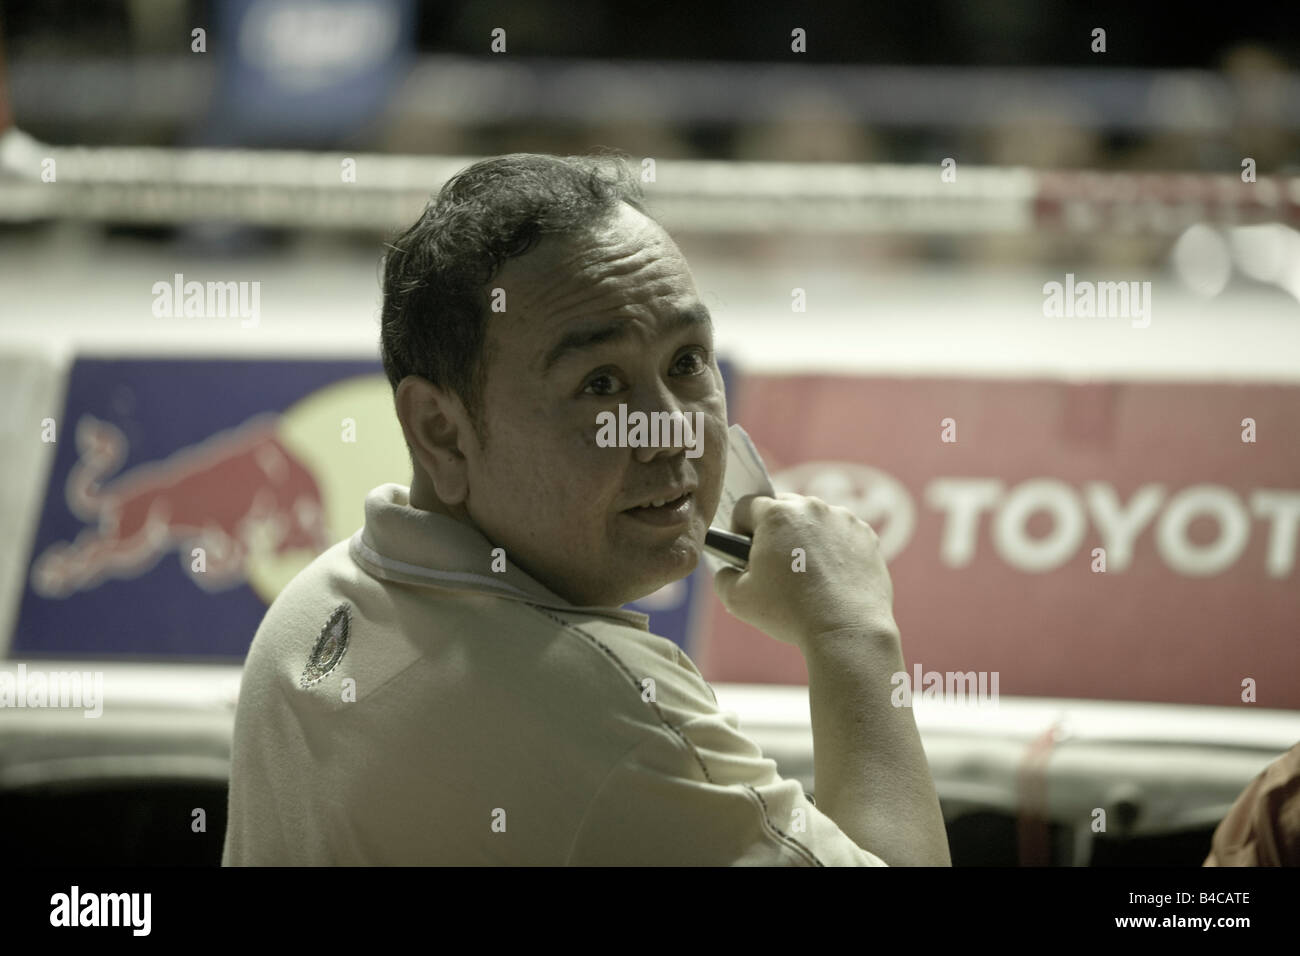 Bookmaker Thai Boxing Lumpinee Stadium Bangkok Thailand - Stock Image